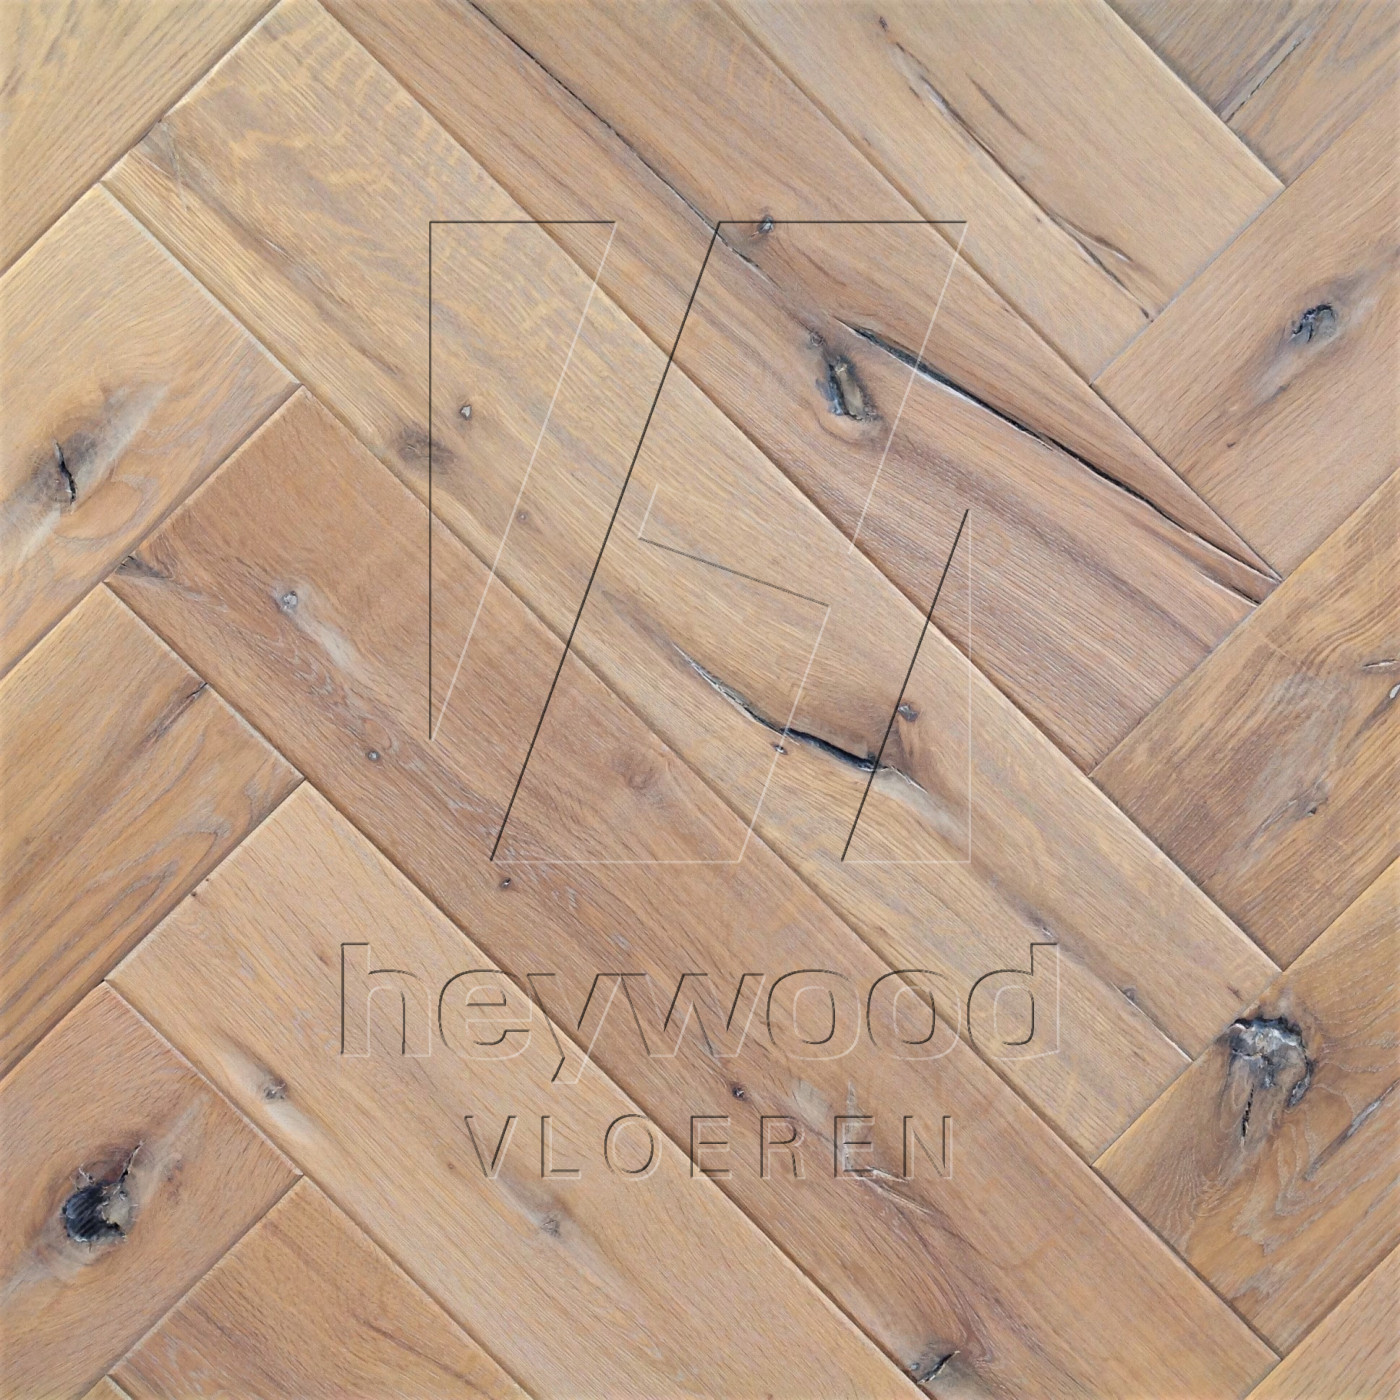 Antique Herringbone 'Gaula coloured' in Herringbone of Pattern & Panel Floors